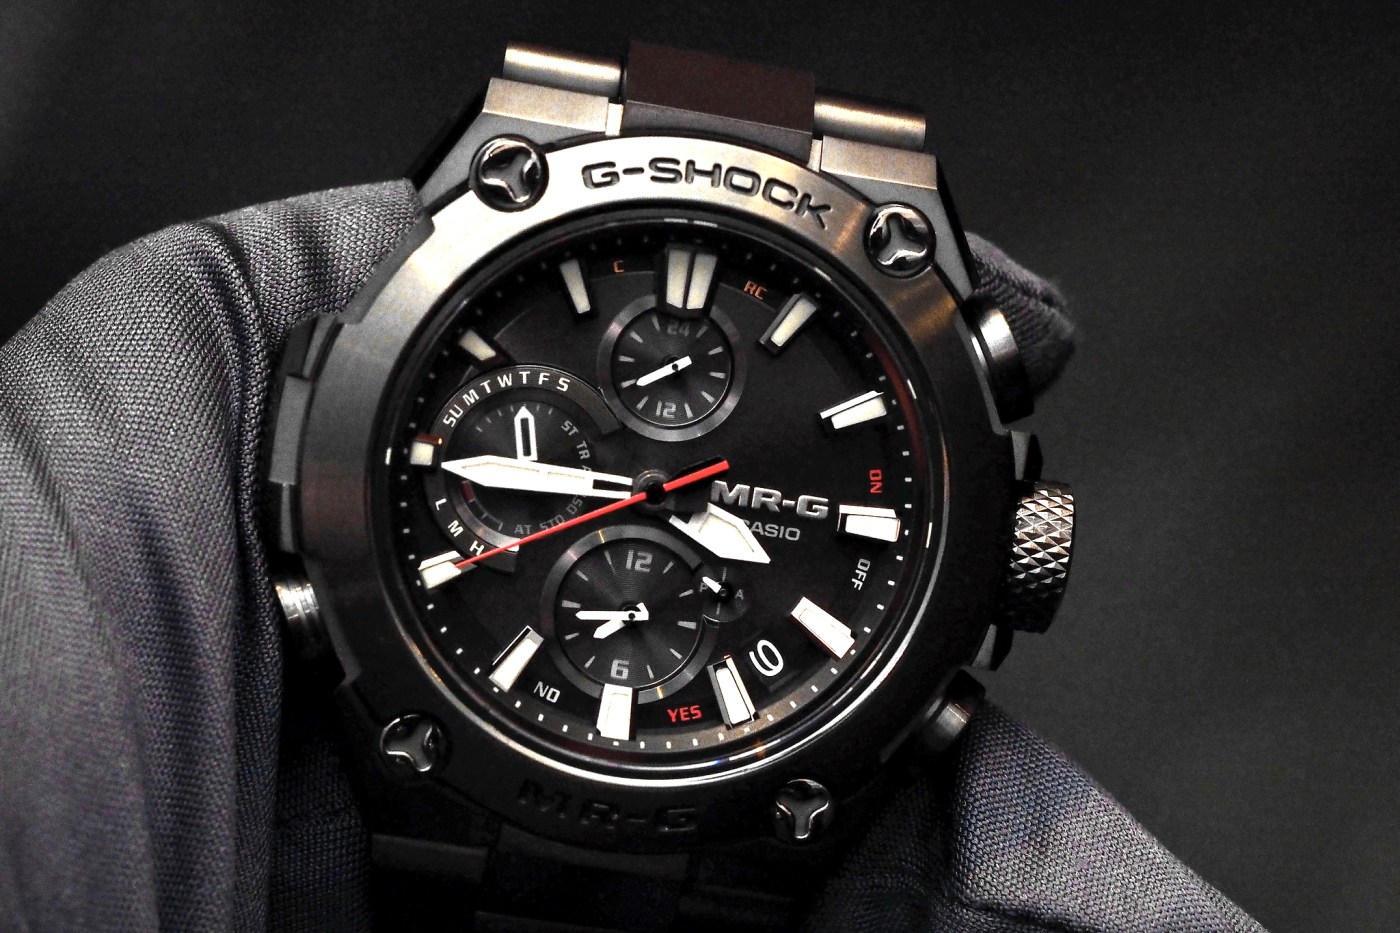 MRG at Casio G-Shock 35th Anniversary Celebration